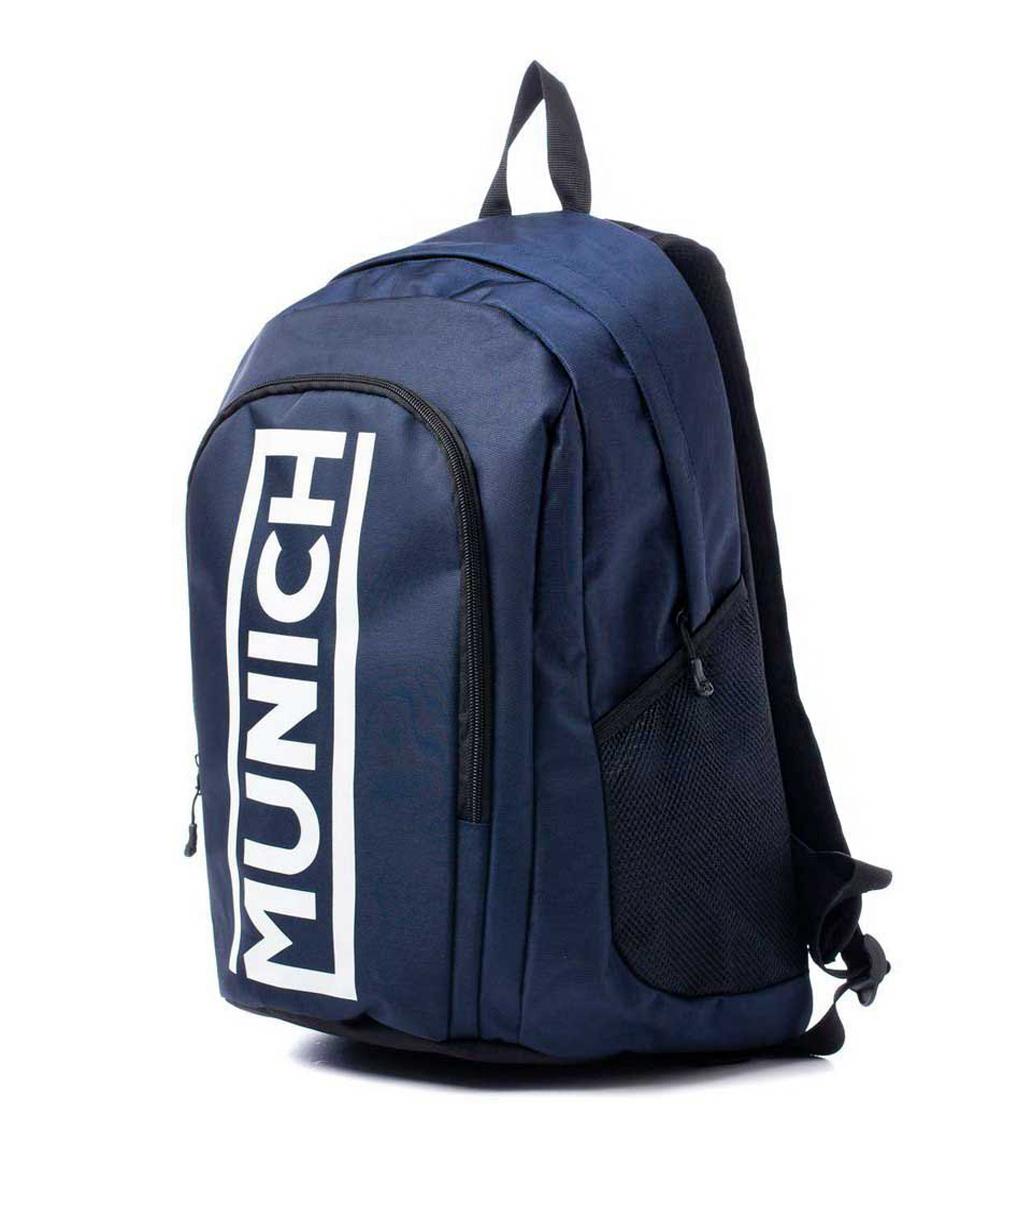 Купить тёмно-синий рюкзак Munich Backpack 146 в интернет-магазине